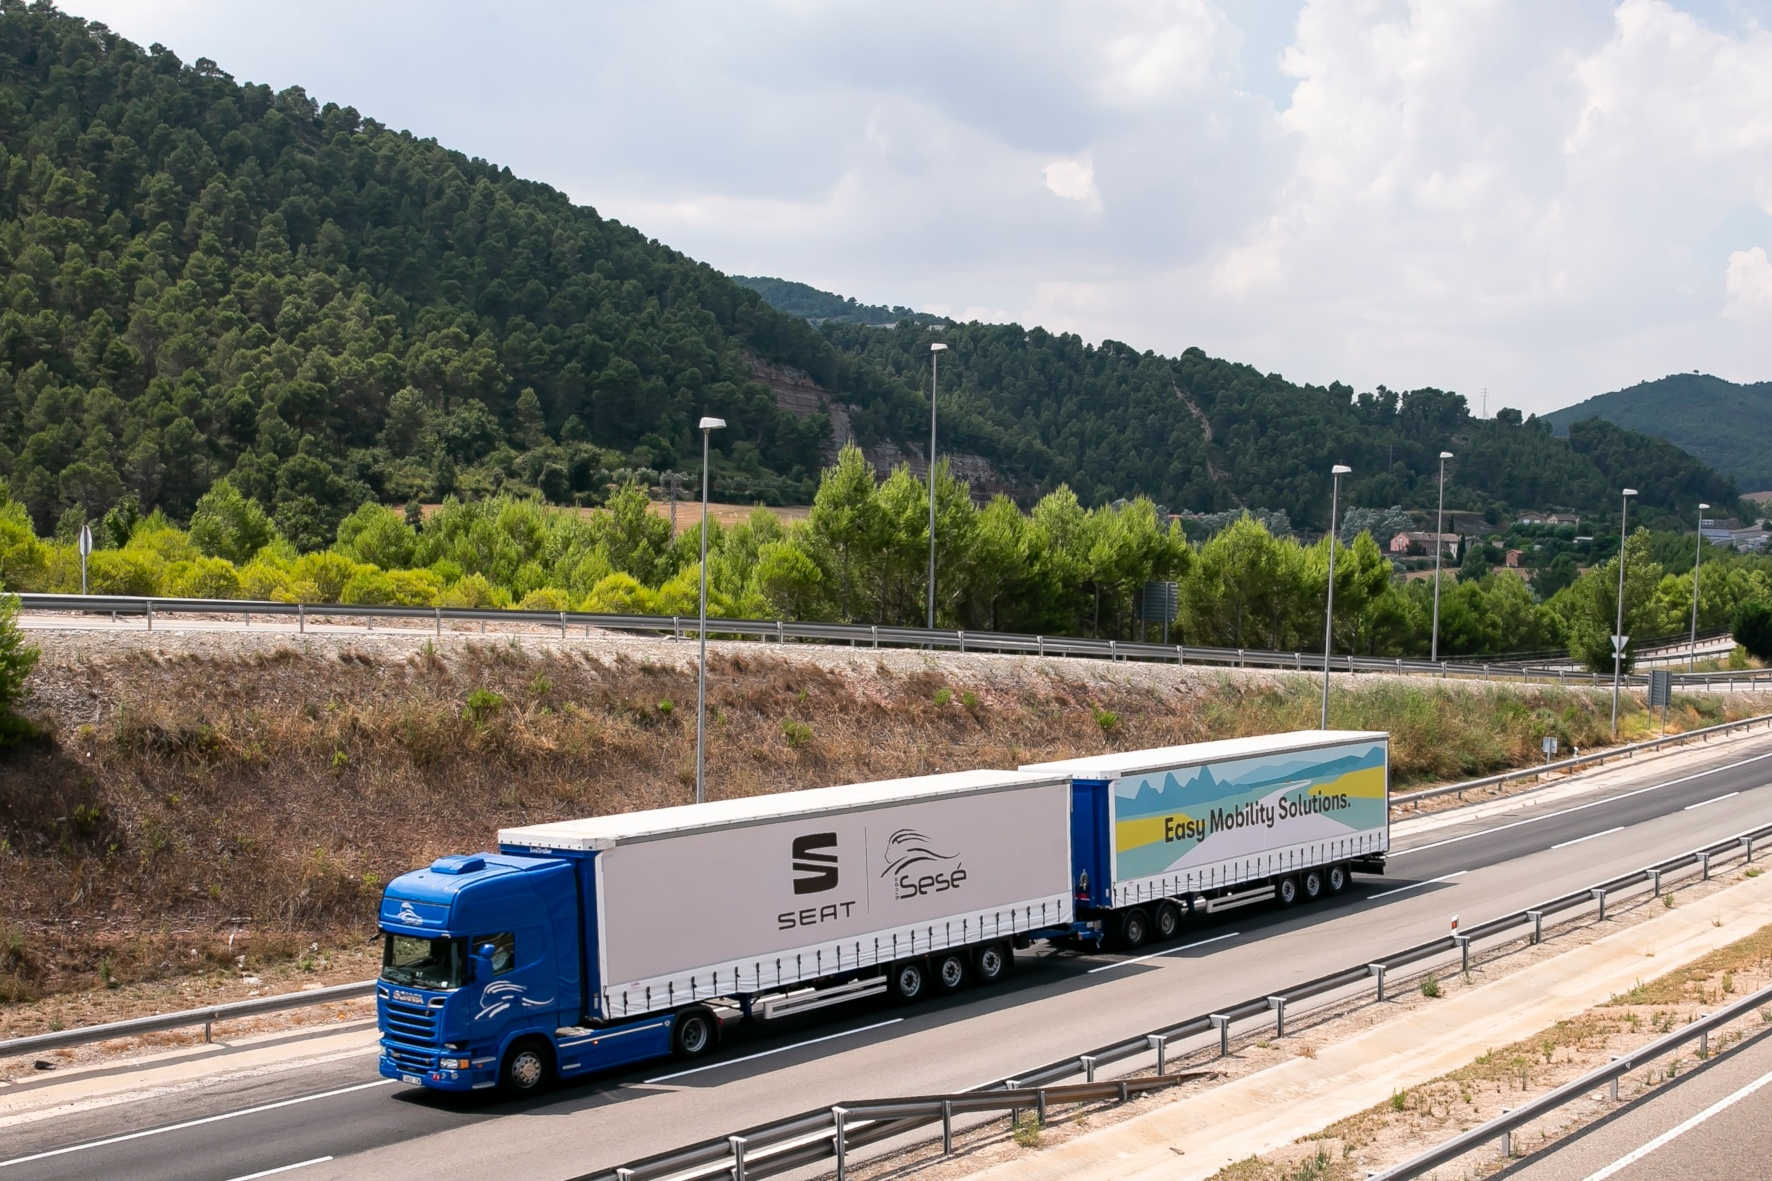 Maxi-Lastkraftwagen soll Frachtkosten senken